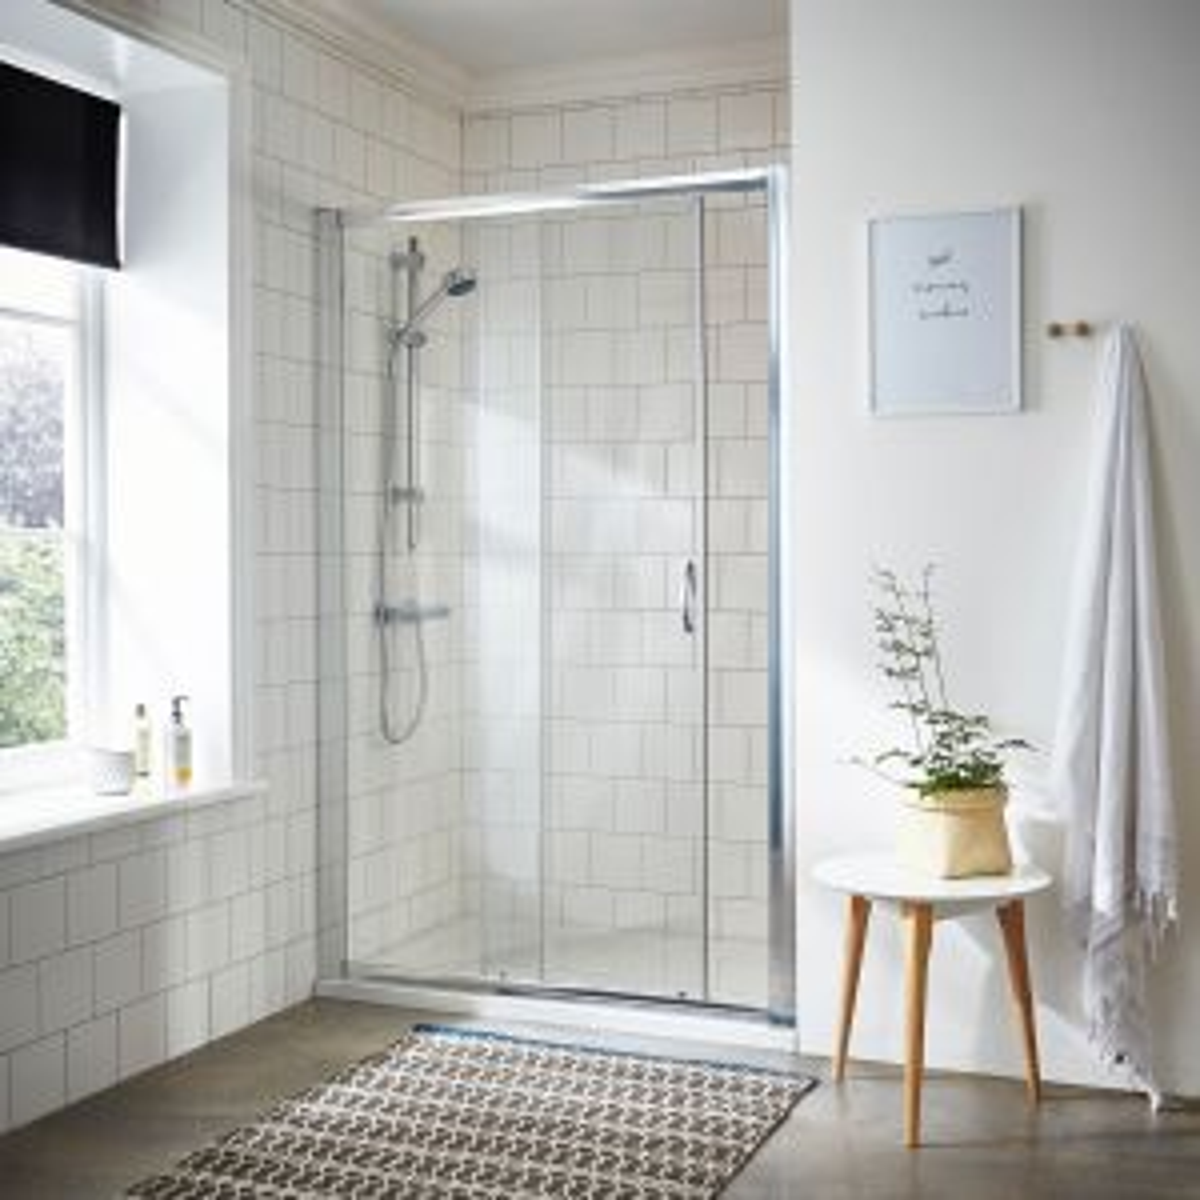 RAK Series 600 Bathroom Suite with Sliding Shower Enclosure